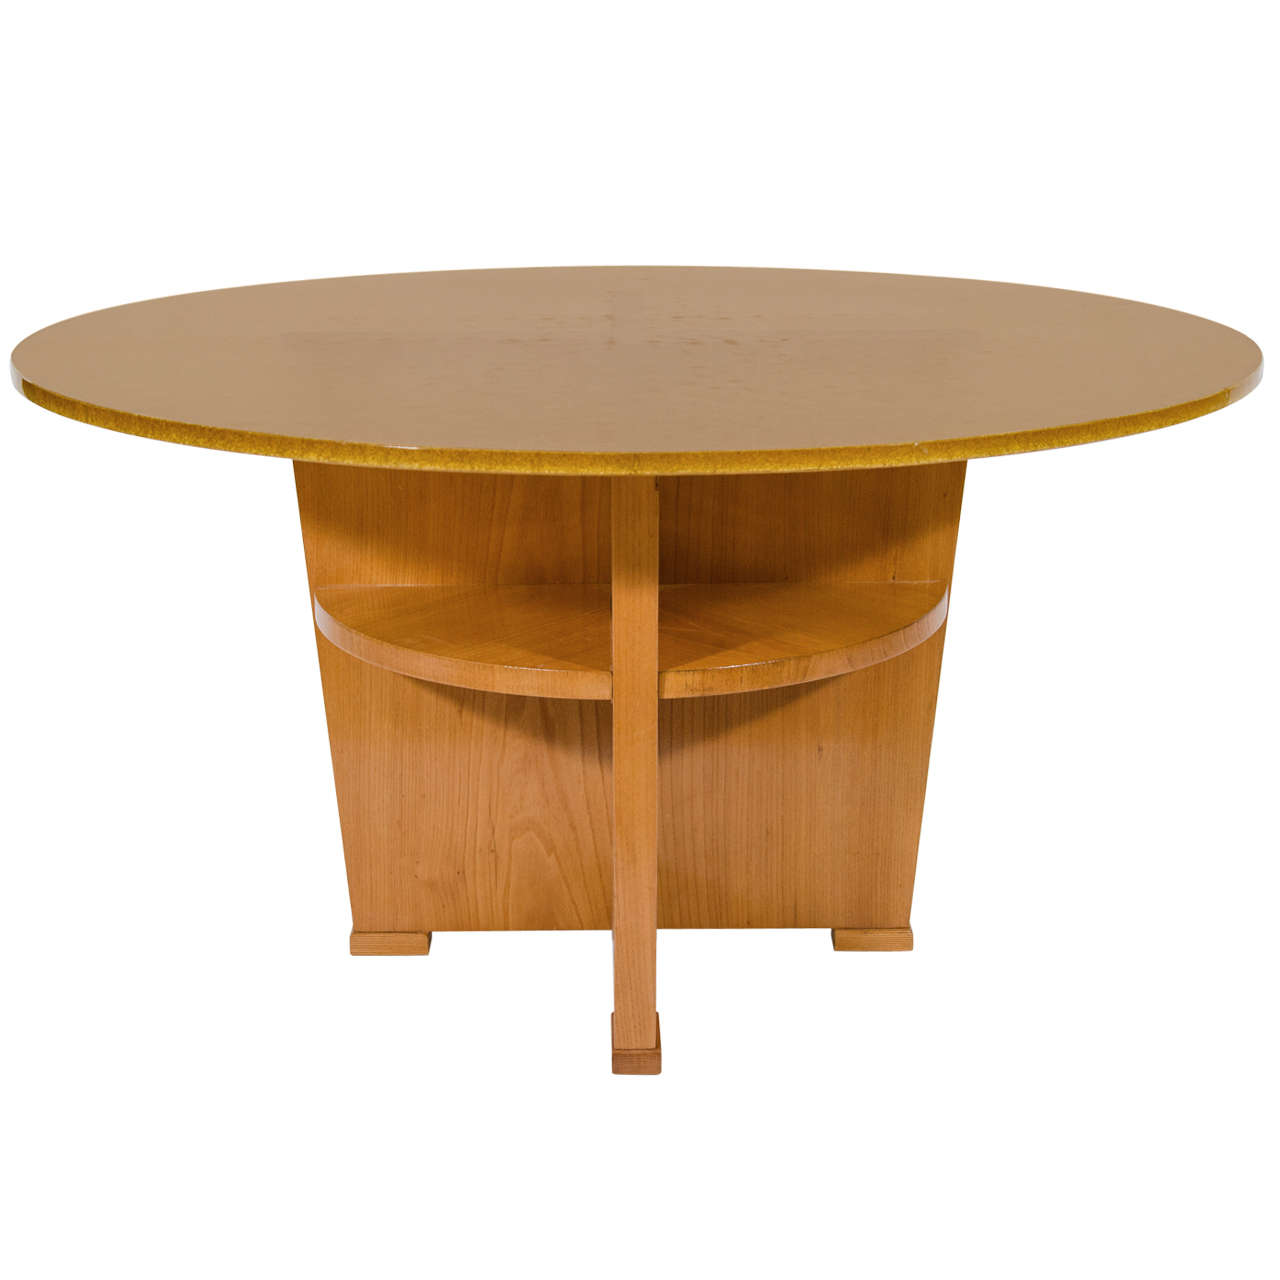 An Art Deco Coffee Table At 1stdibs